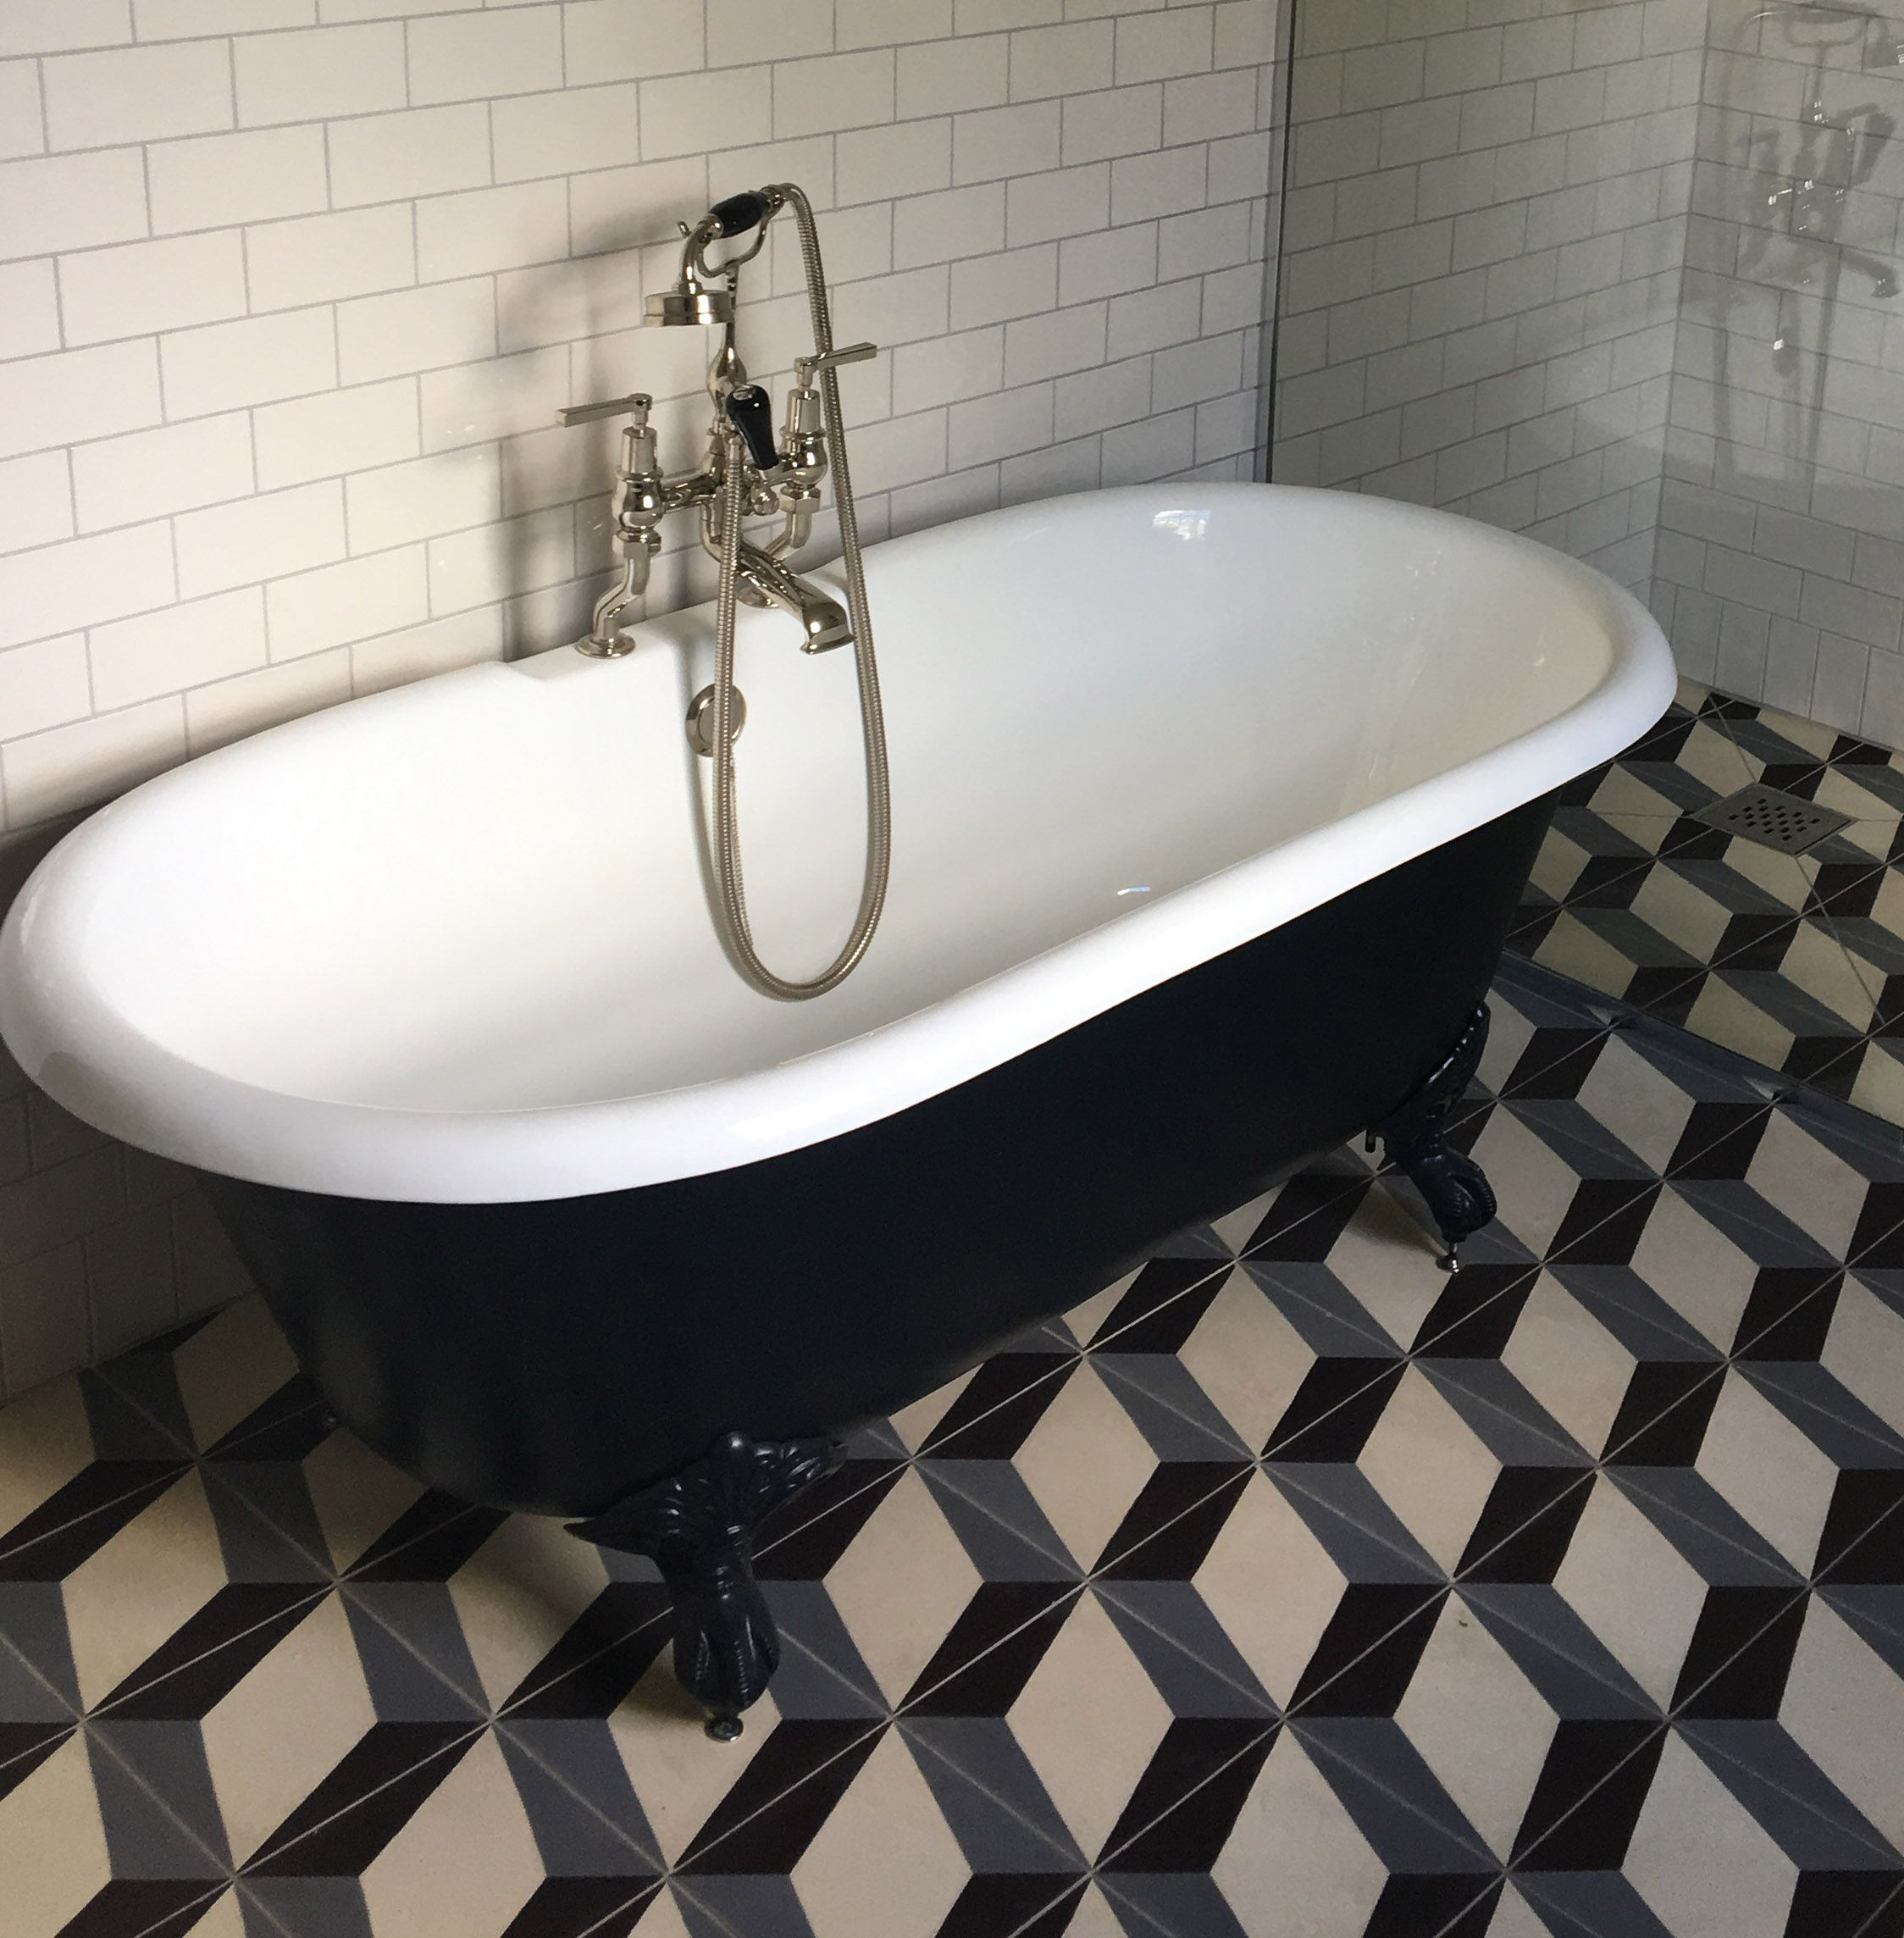 Our Nadia Aubergine Grey Encaustic Cement Tile , Utilised Beautifully